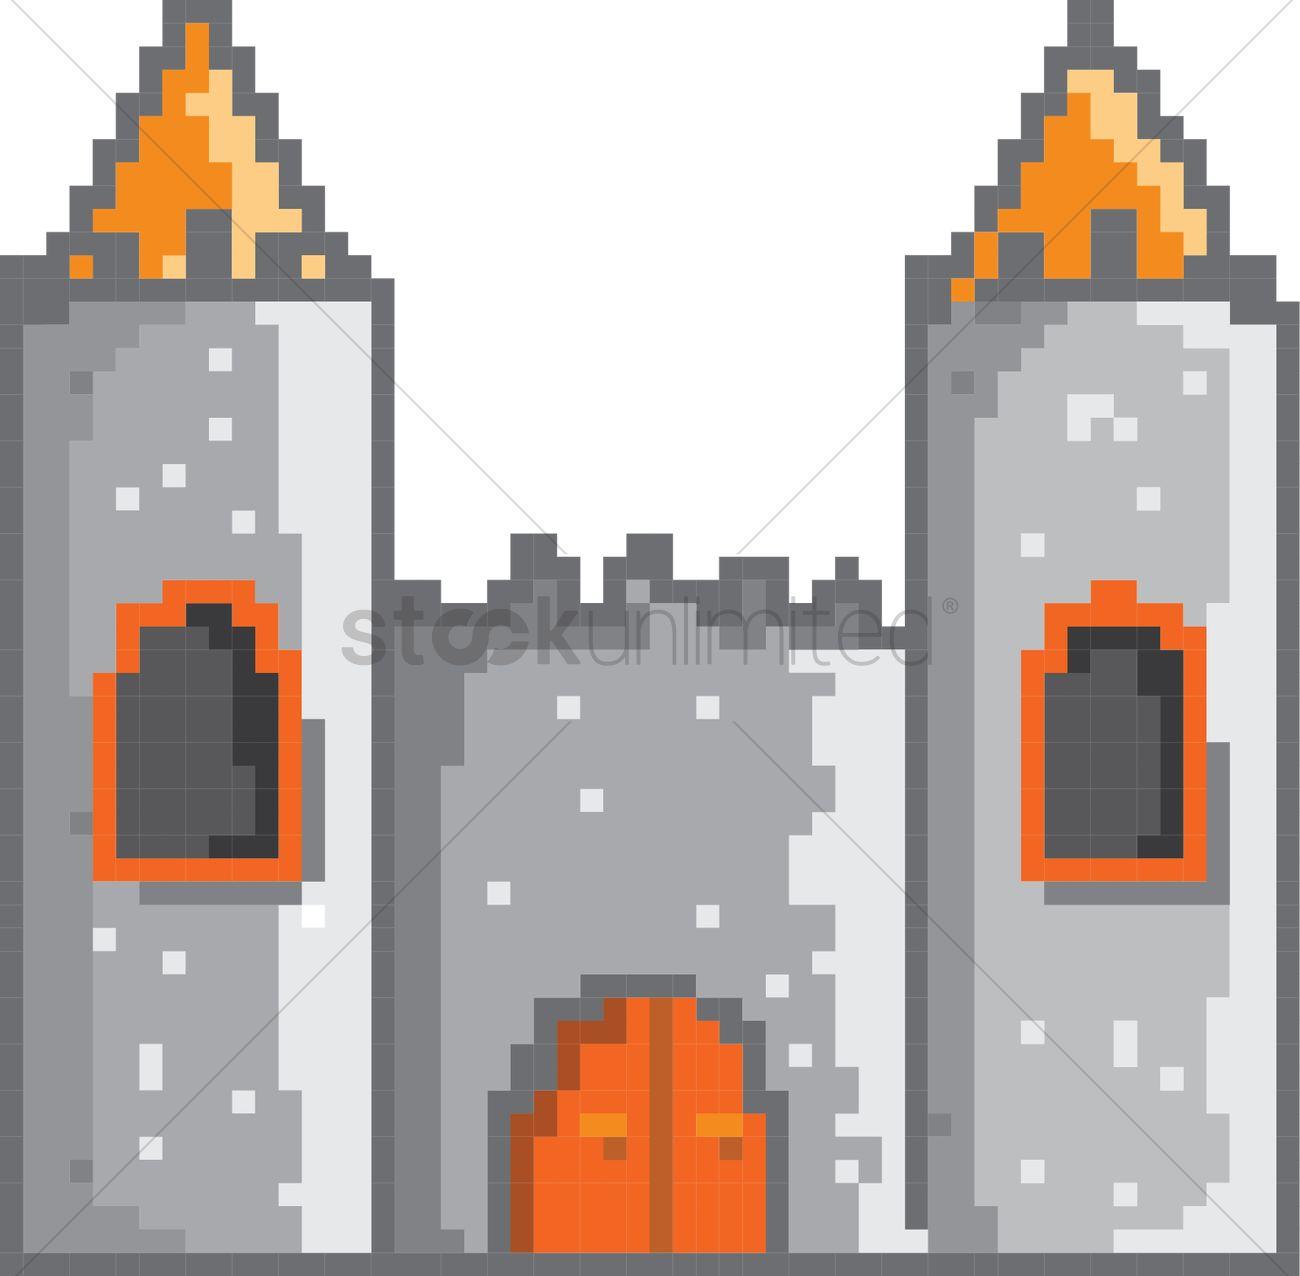 Castle Pixel Art Vector Image 2021123 Stockunlimited